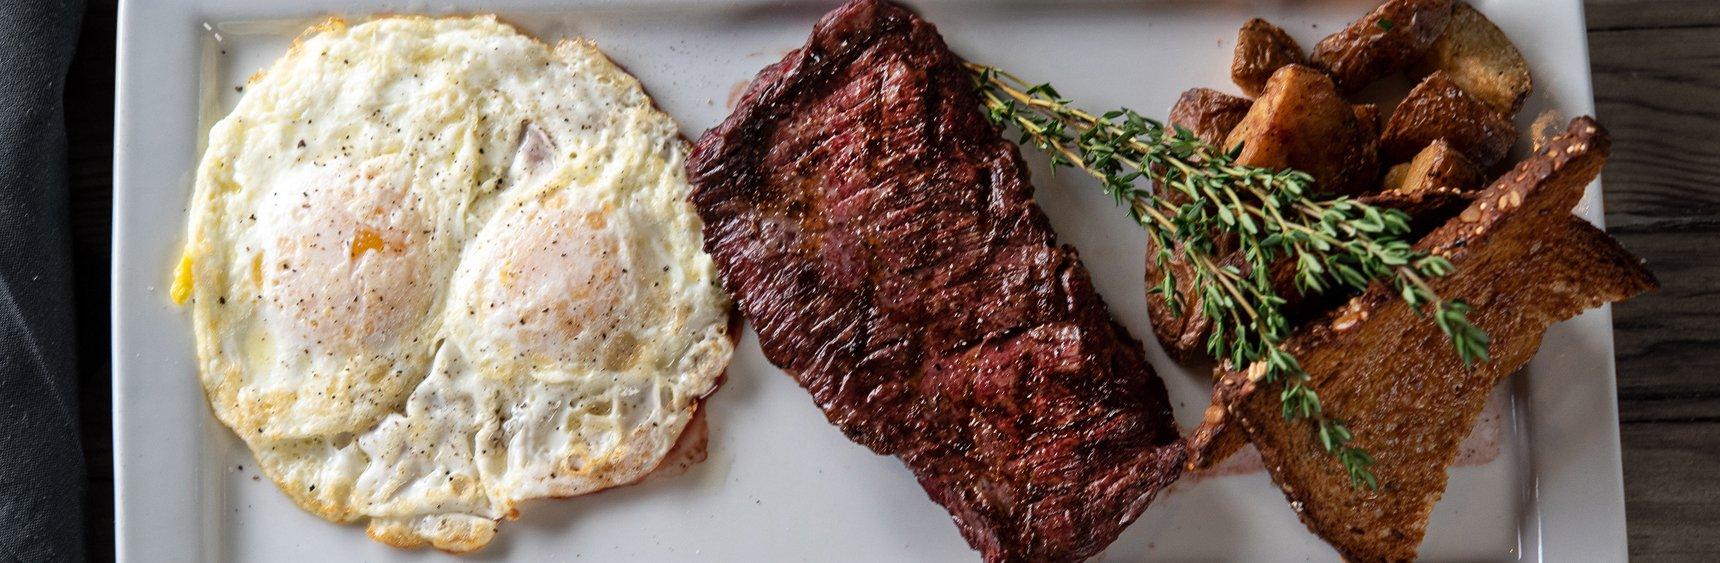 Overhead of egg and steak breakfast on plate